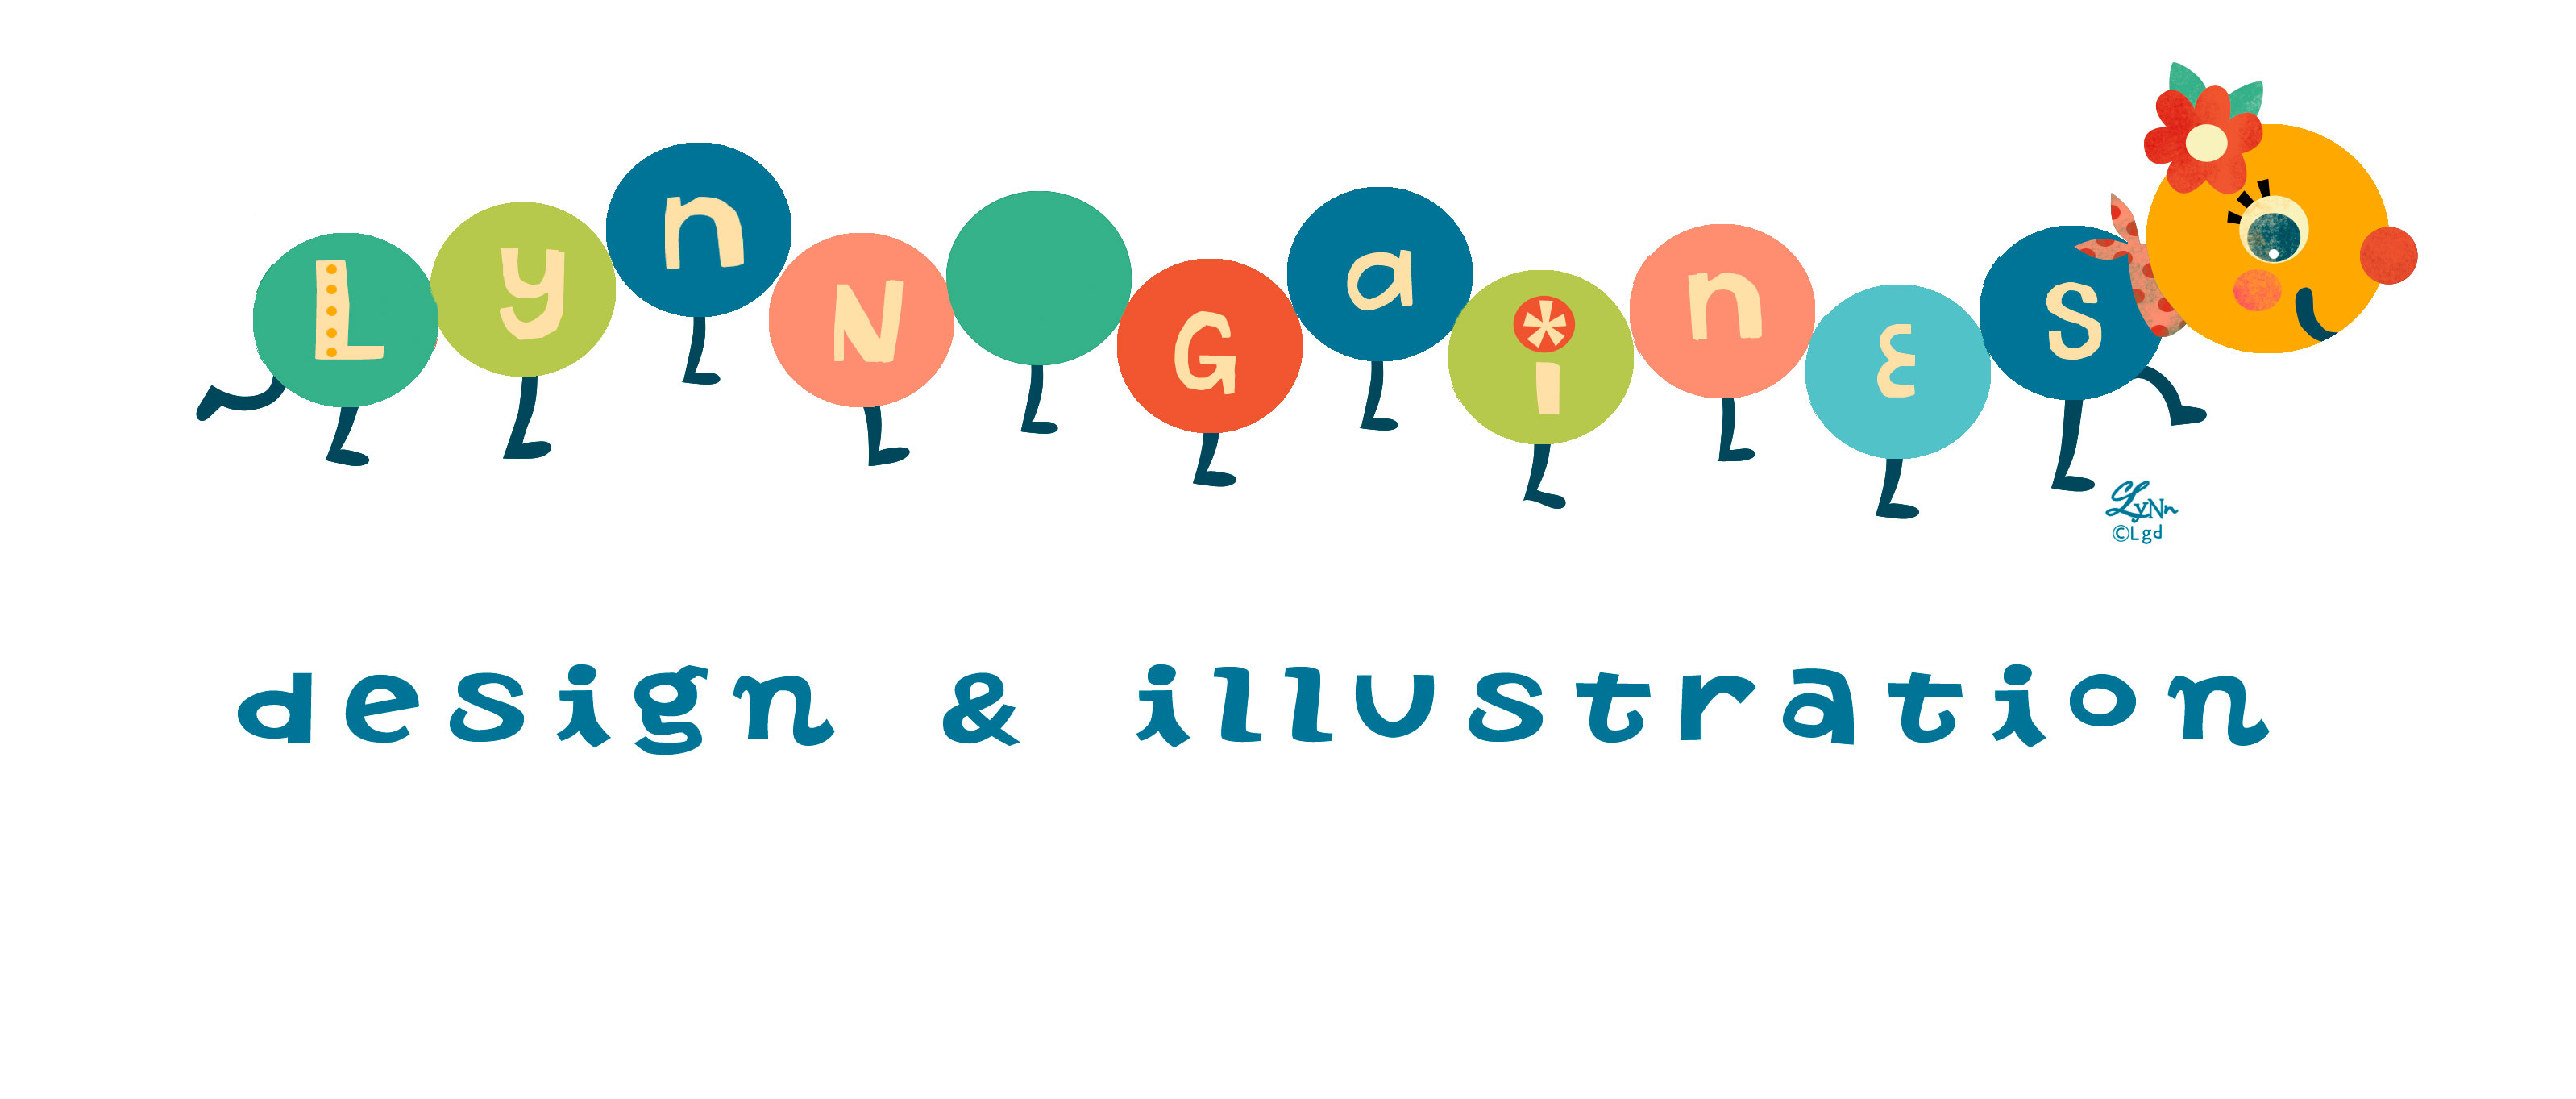 lynn gaines design and illustration